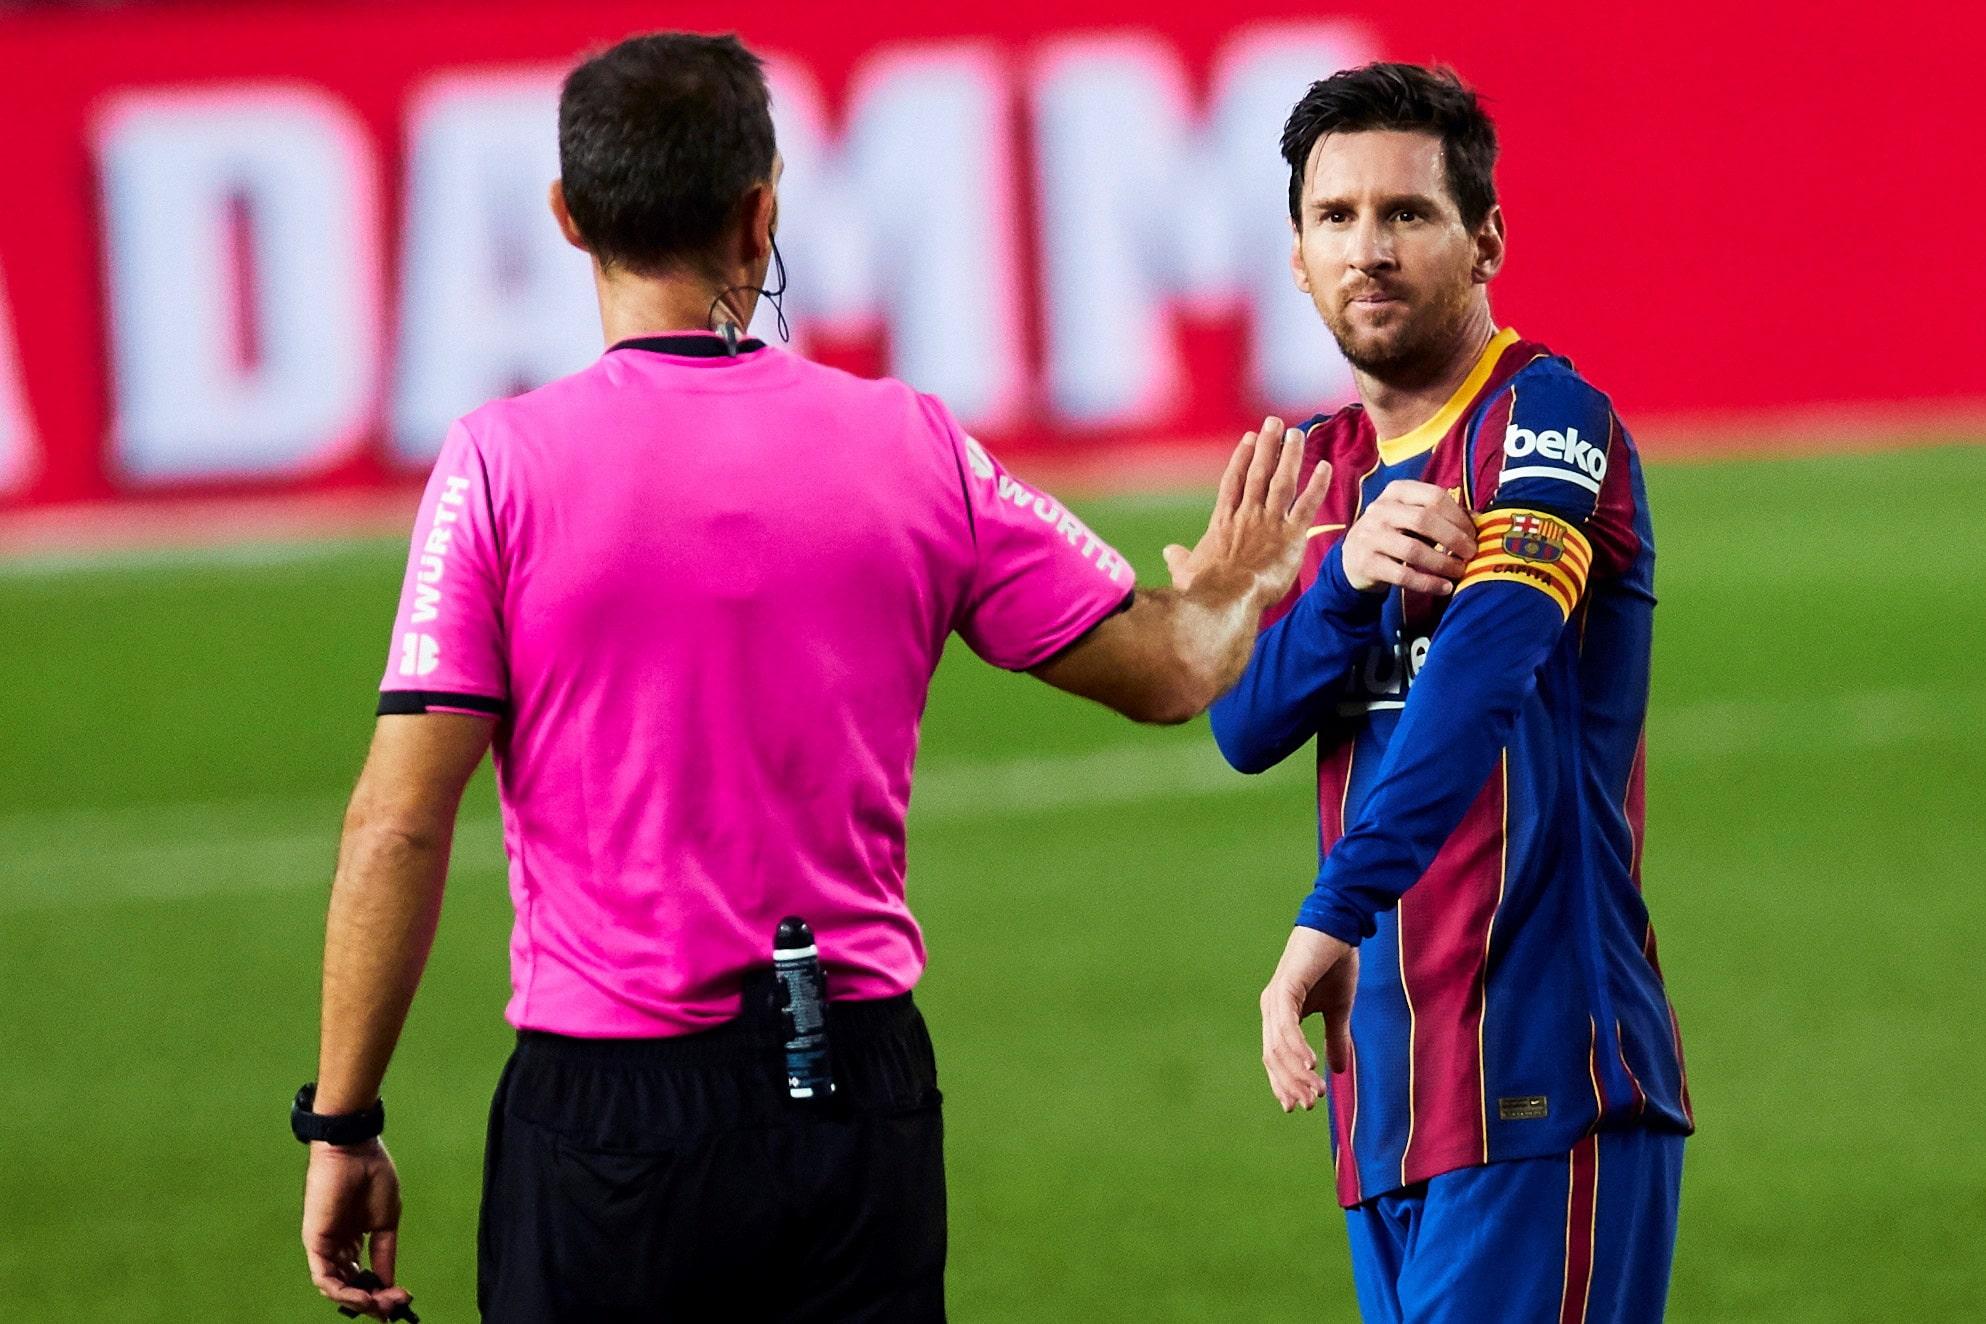 21/11/2020 Daily Predictions: Spain LaLiga, Atletico Madrid vs. Barcelona